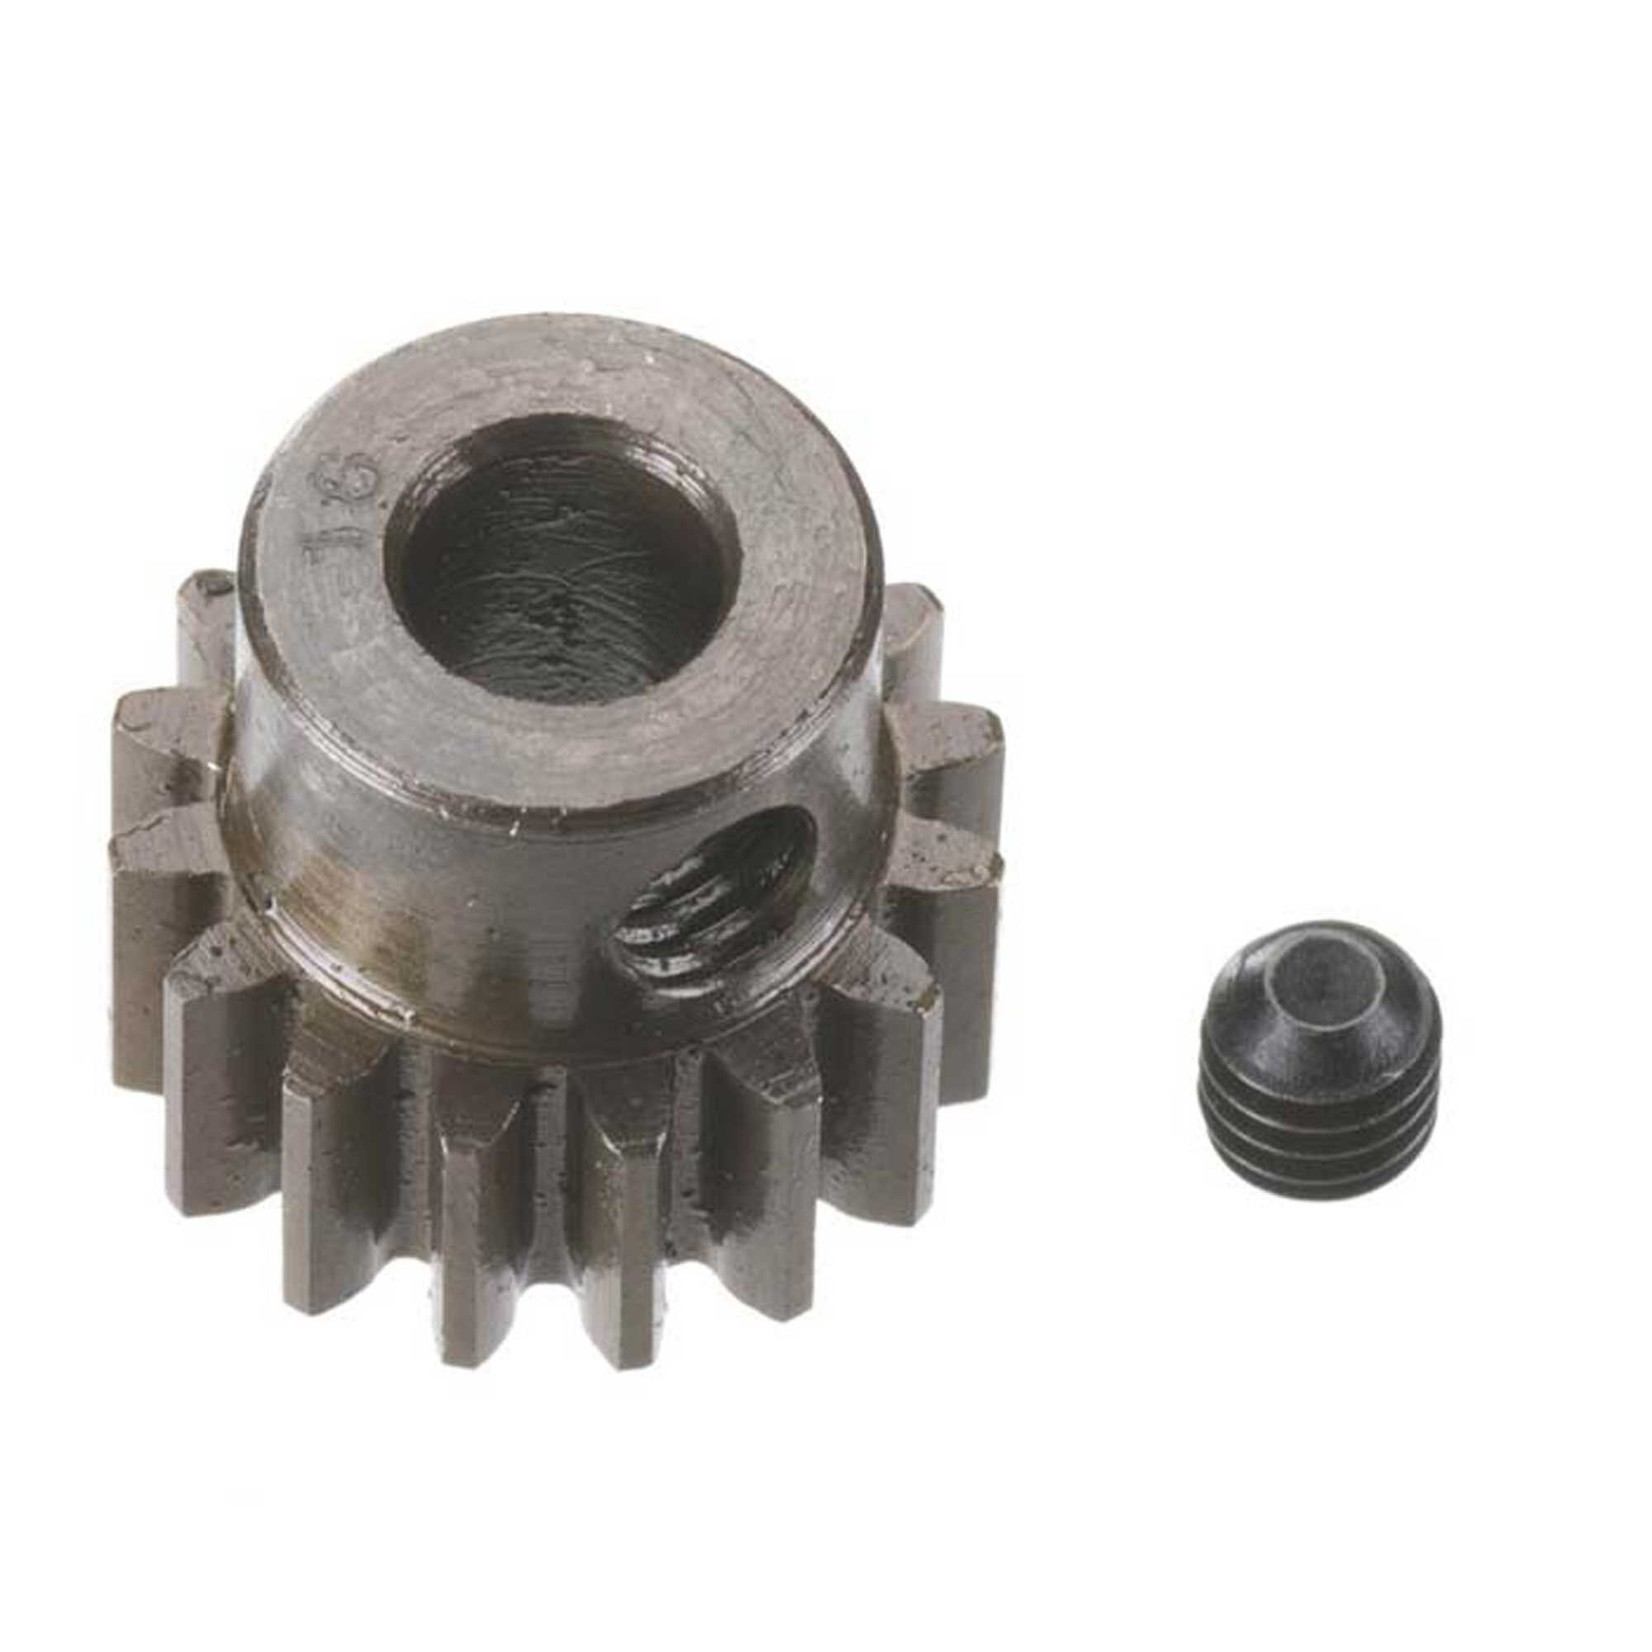 Robinson Racing Products RRP8716 Robinson Racing Extra Hard Steel .8 Mod Pinion Gear w/5mm Bore (16T)